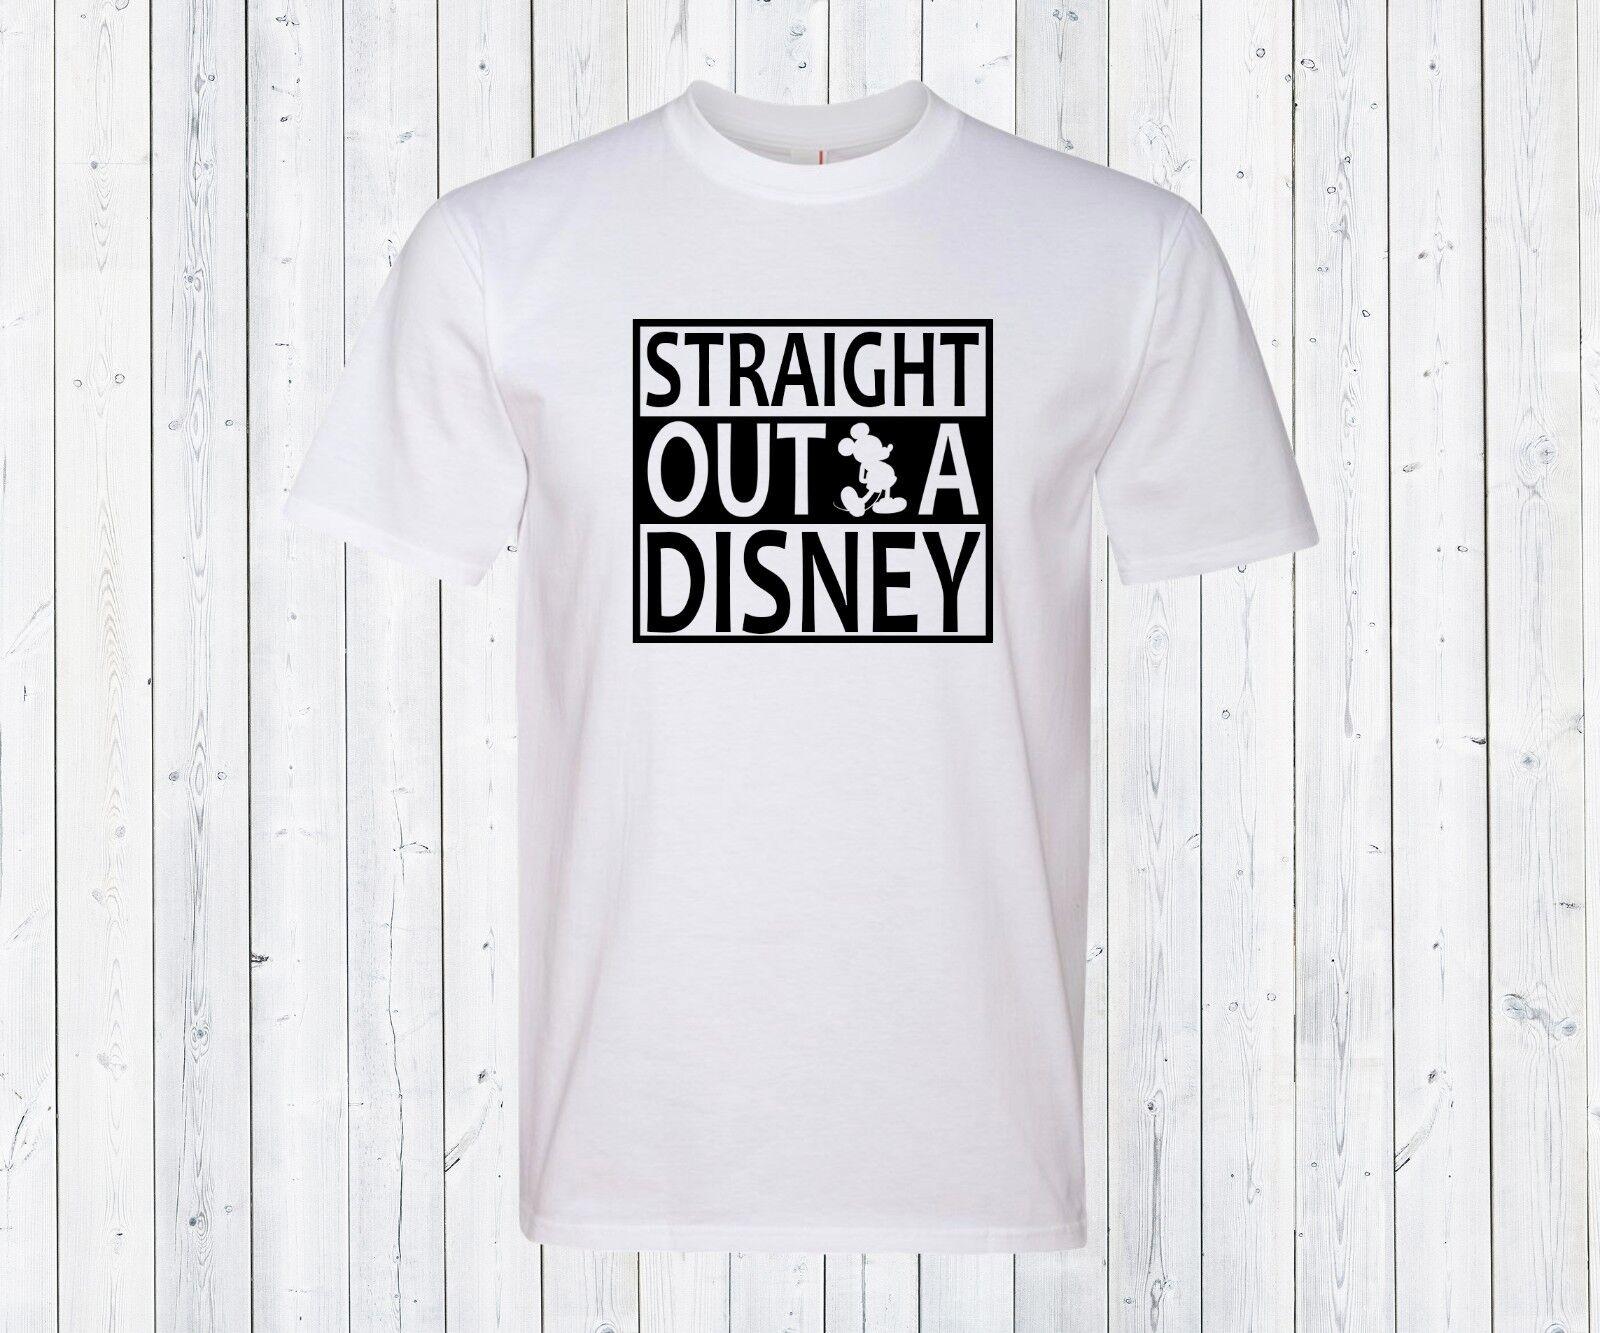 Straight Outta Disney Mens Shirt Disneyland Gift for hubby